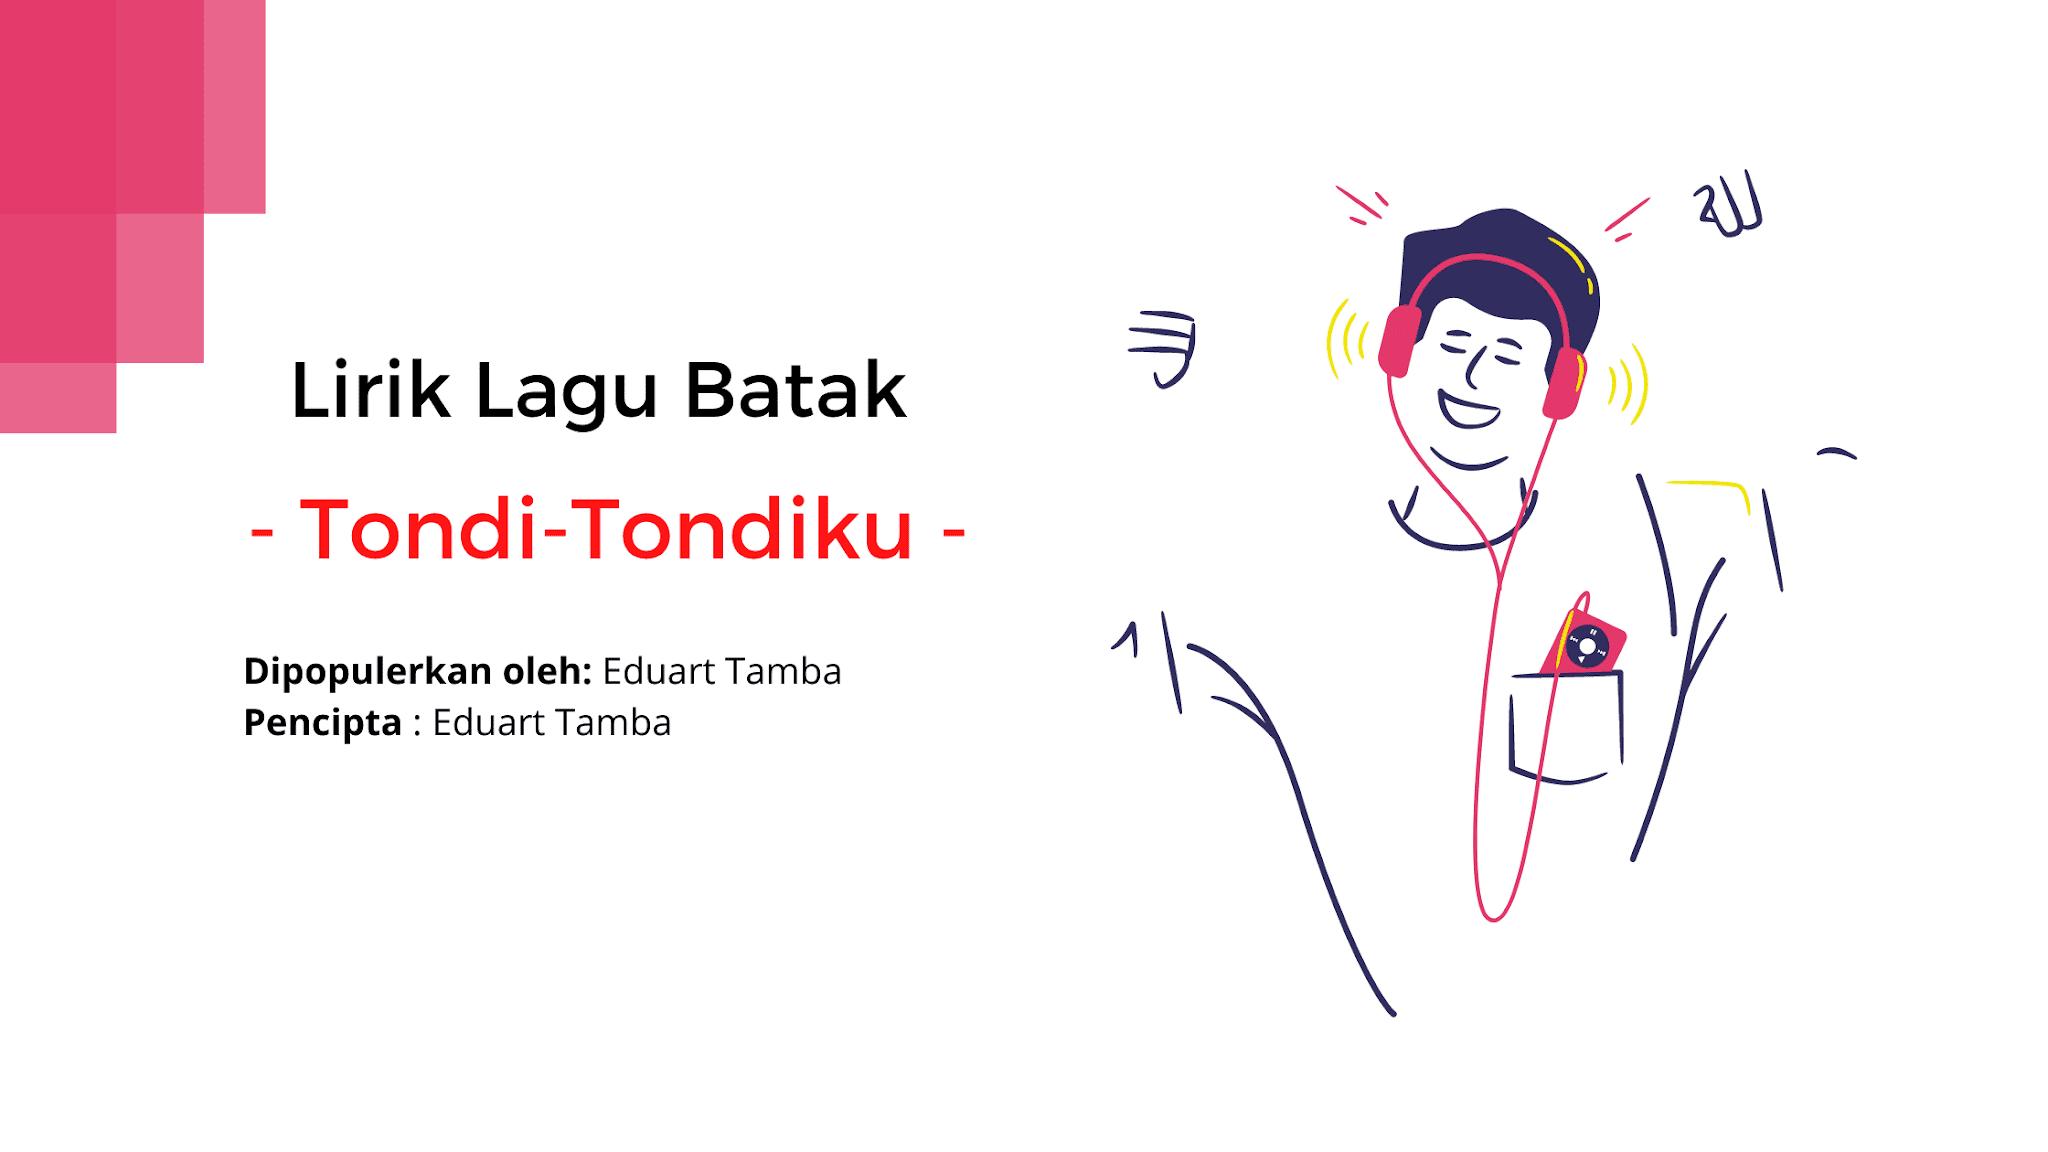 Lirik Lagu Batak [ Tondi-Tondiku Do Ho ] Style Voice